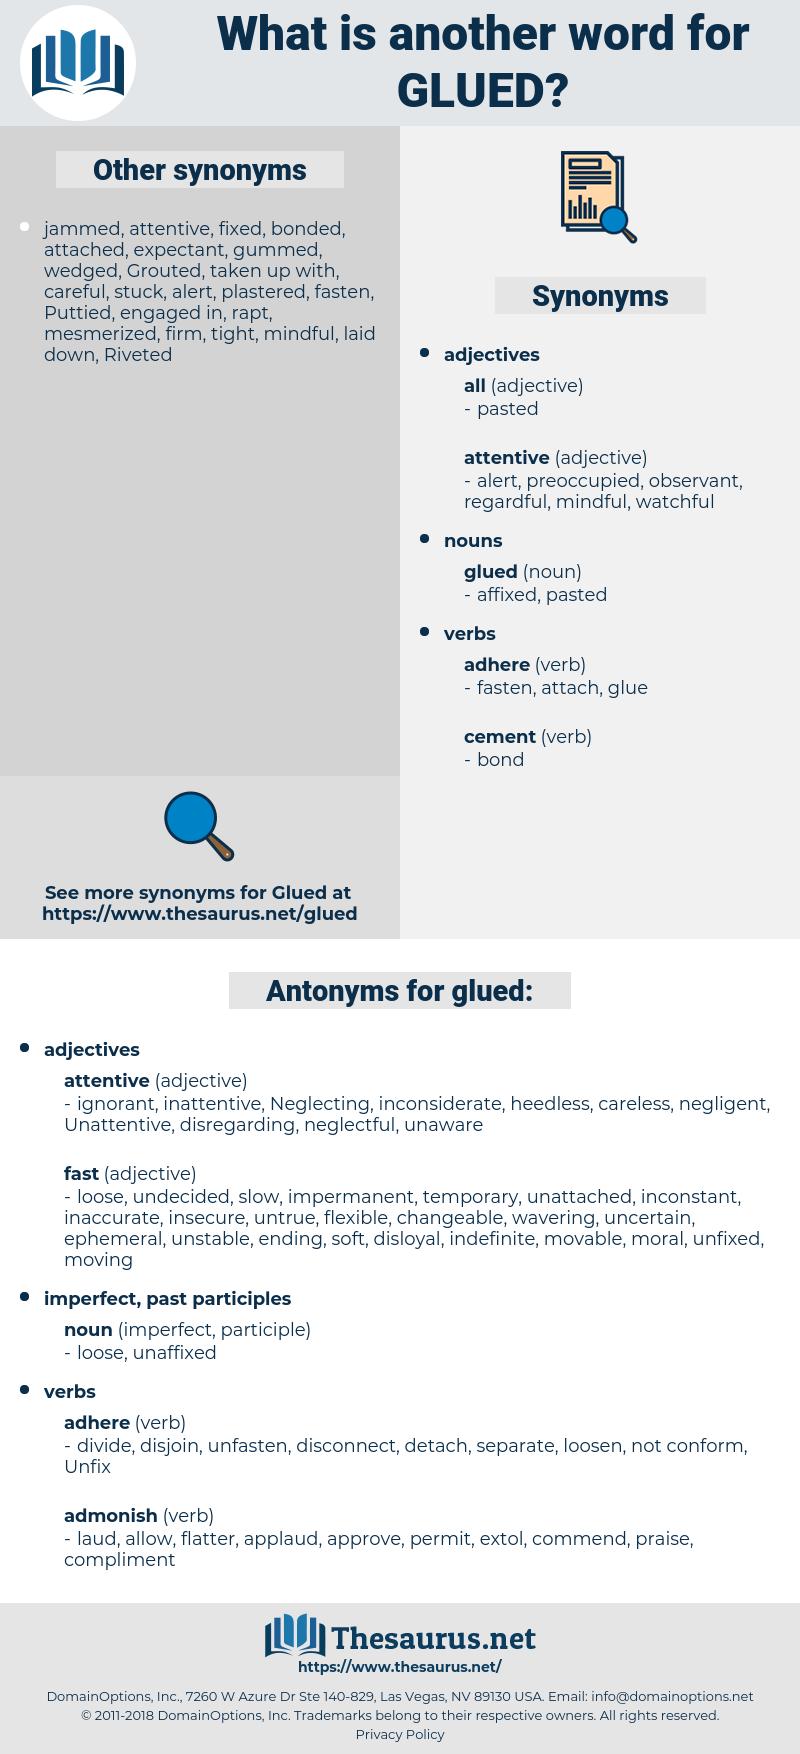 glued, synonym glued, another word for glued, words like glued, thesaurus glued